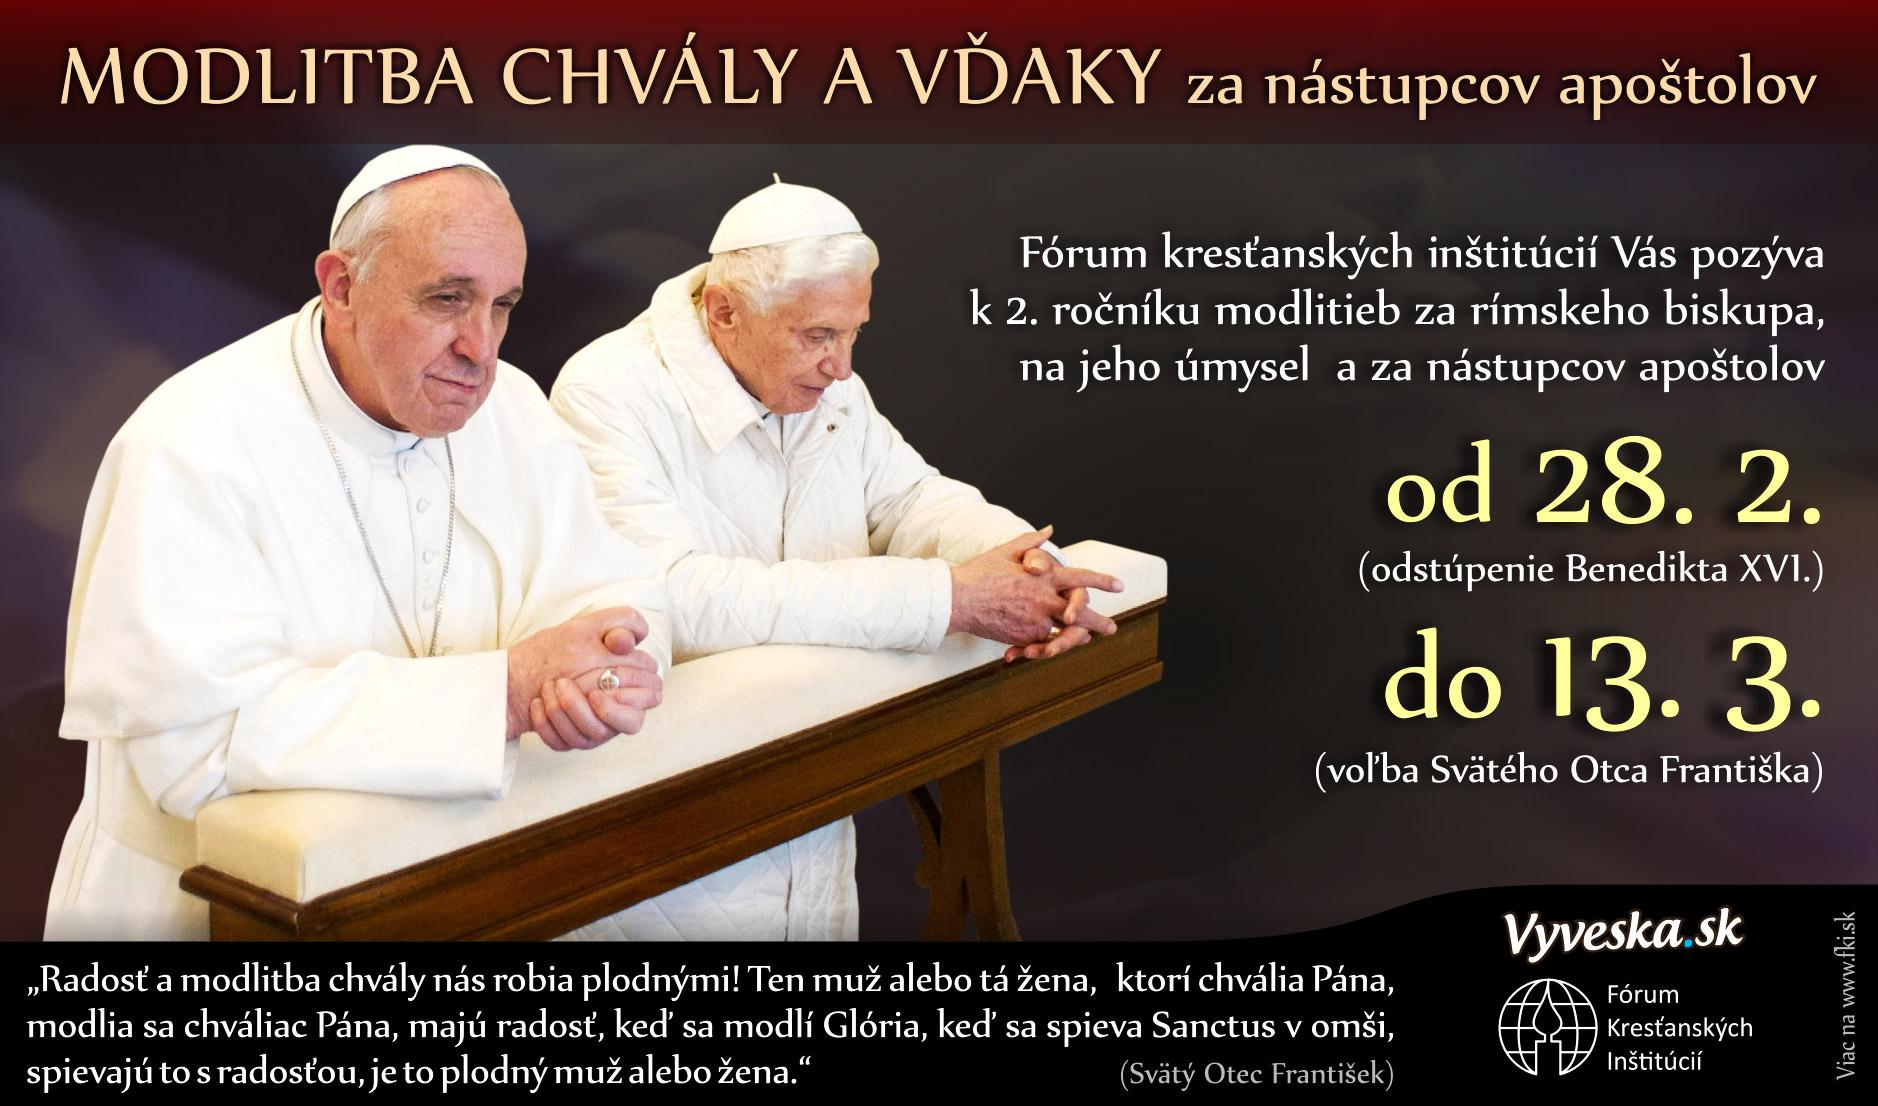 Modlitba chvály a vďaky za nástupcov apoštolov